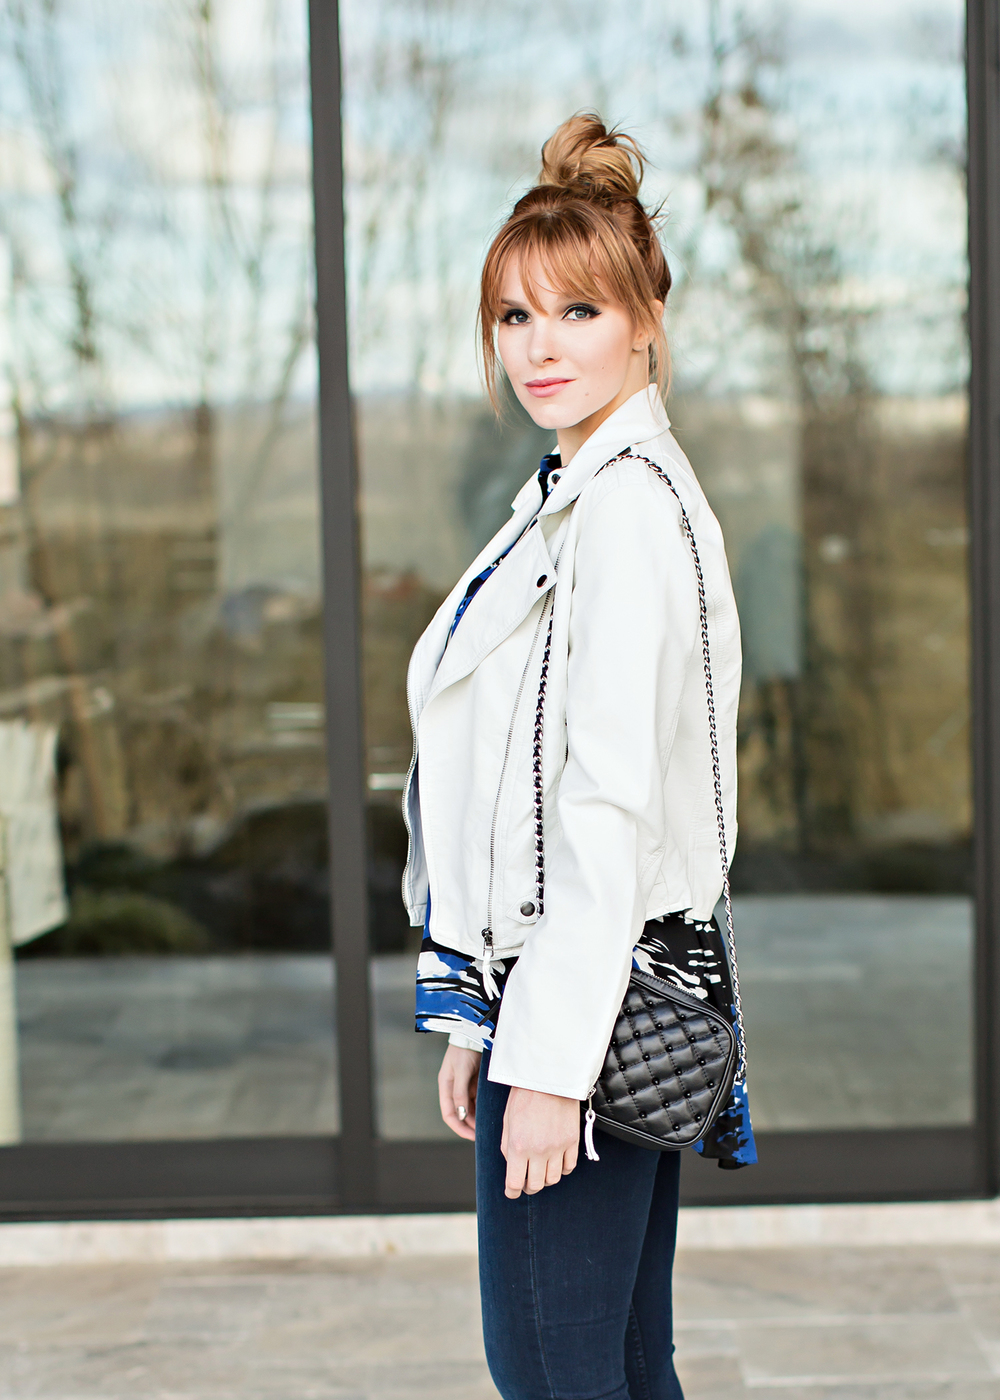 redhead fashion wearing white leather jacket